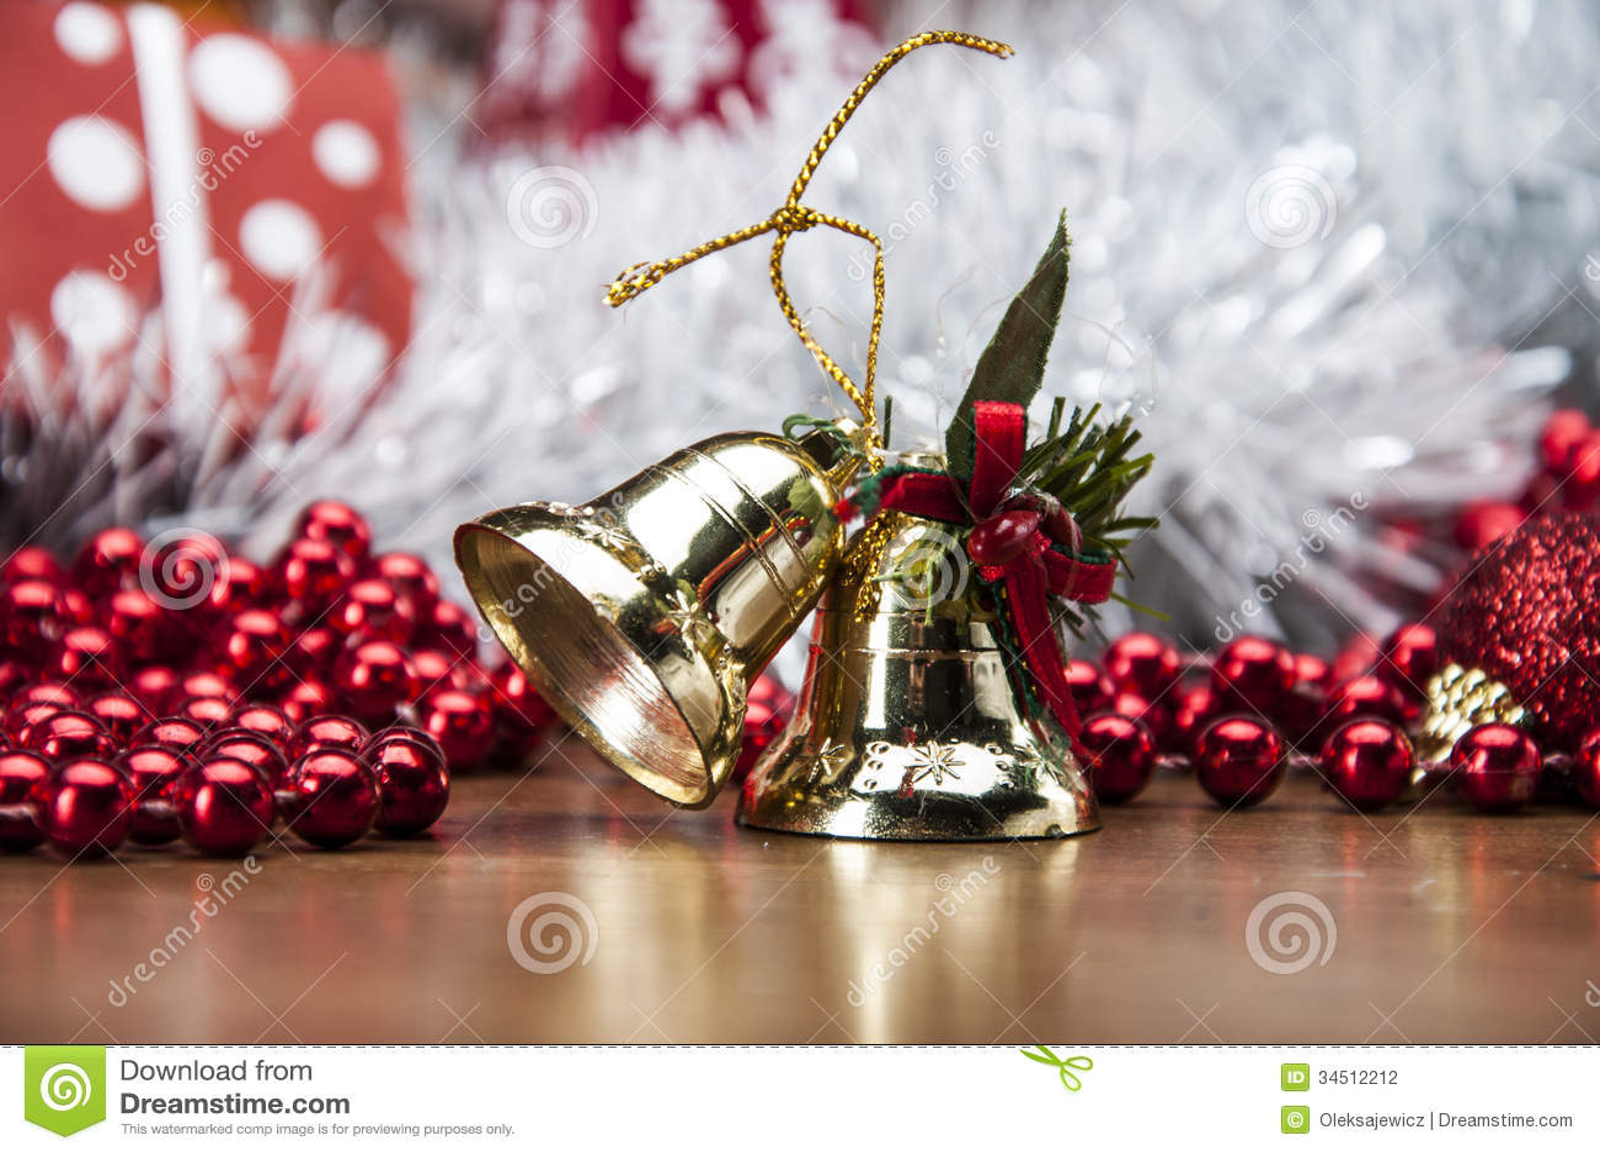 christmas stuff on clearance